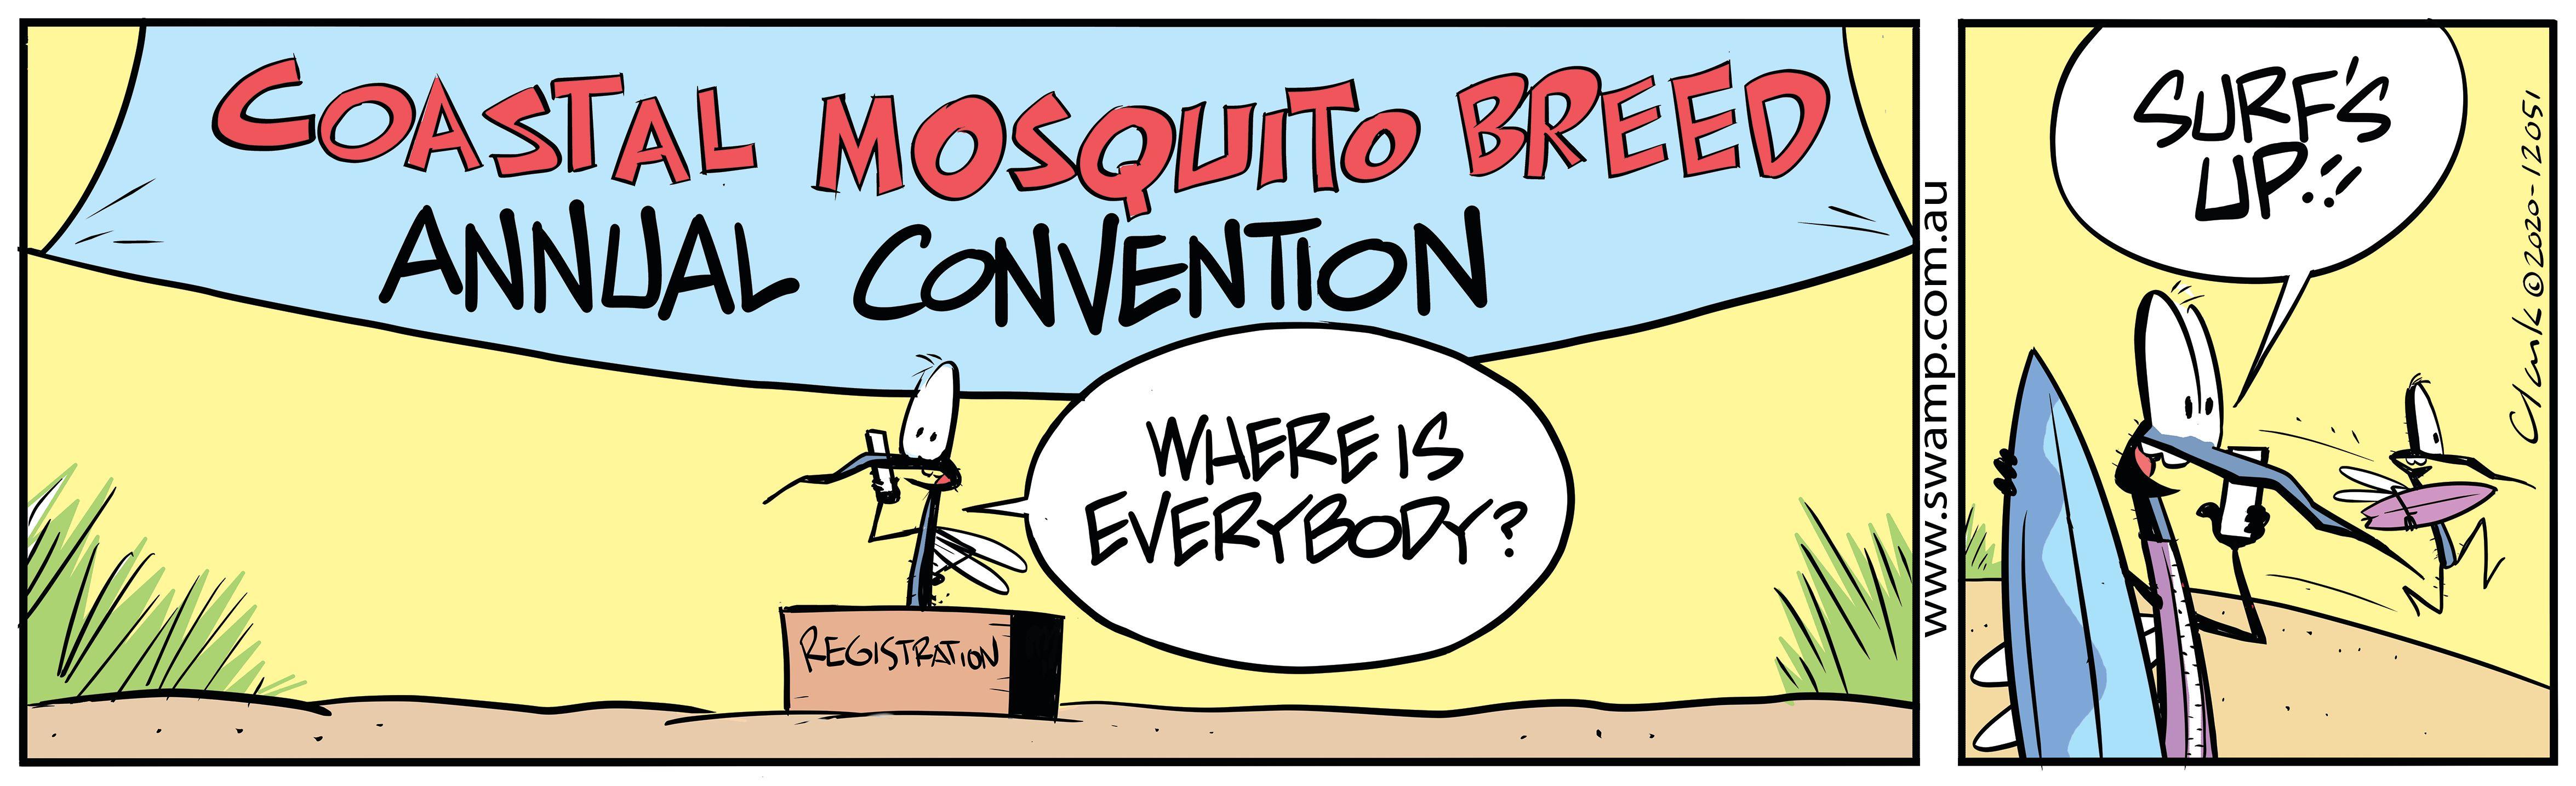 Coastal Mosquito Breed